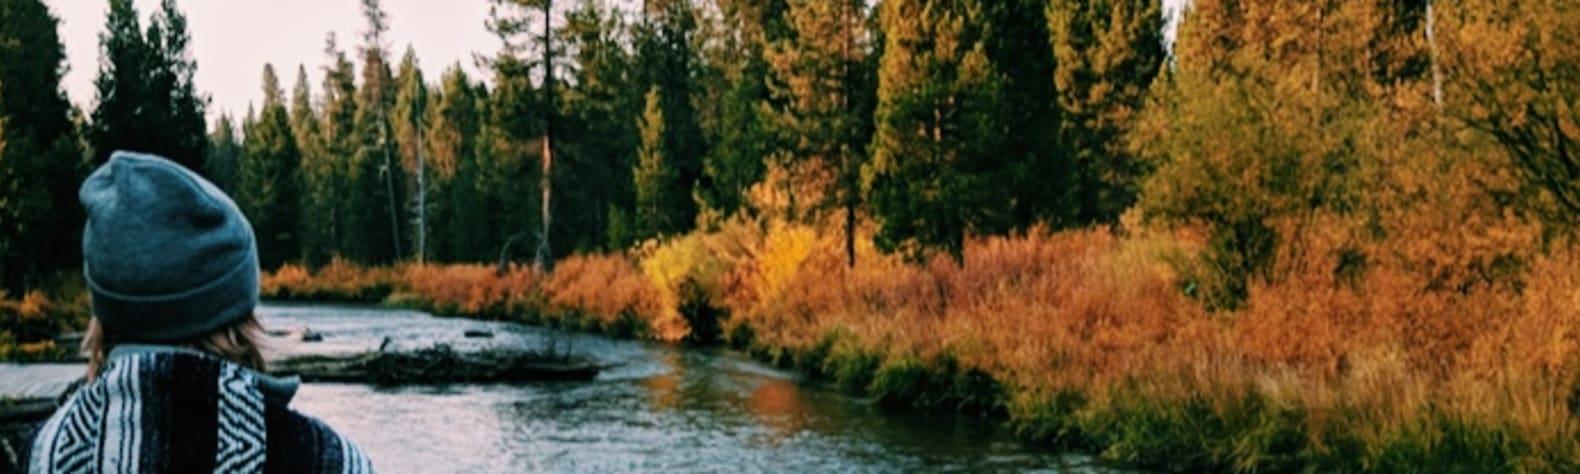 Wild River Sanctuary